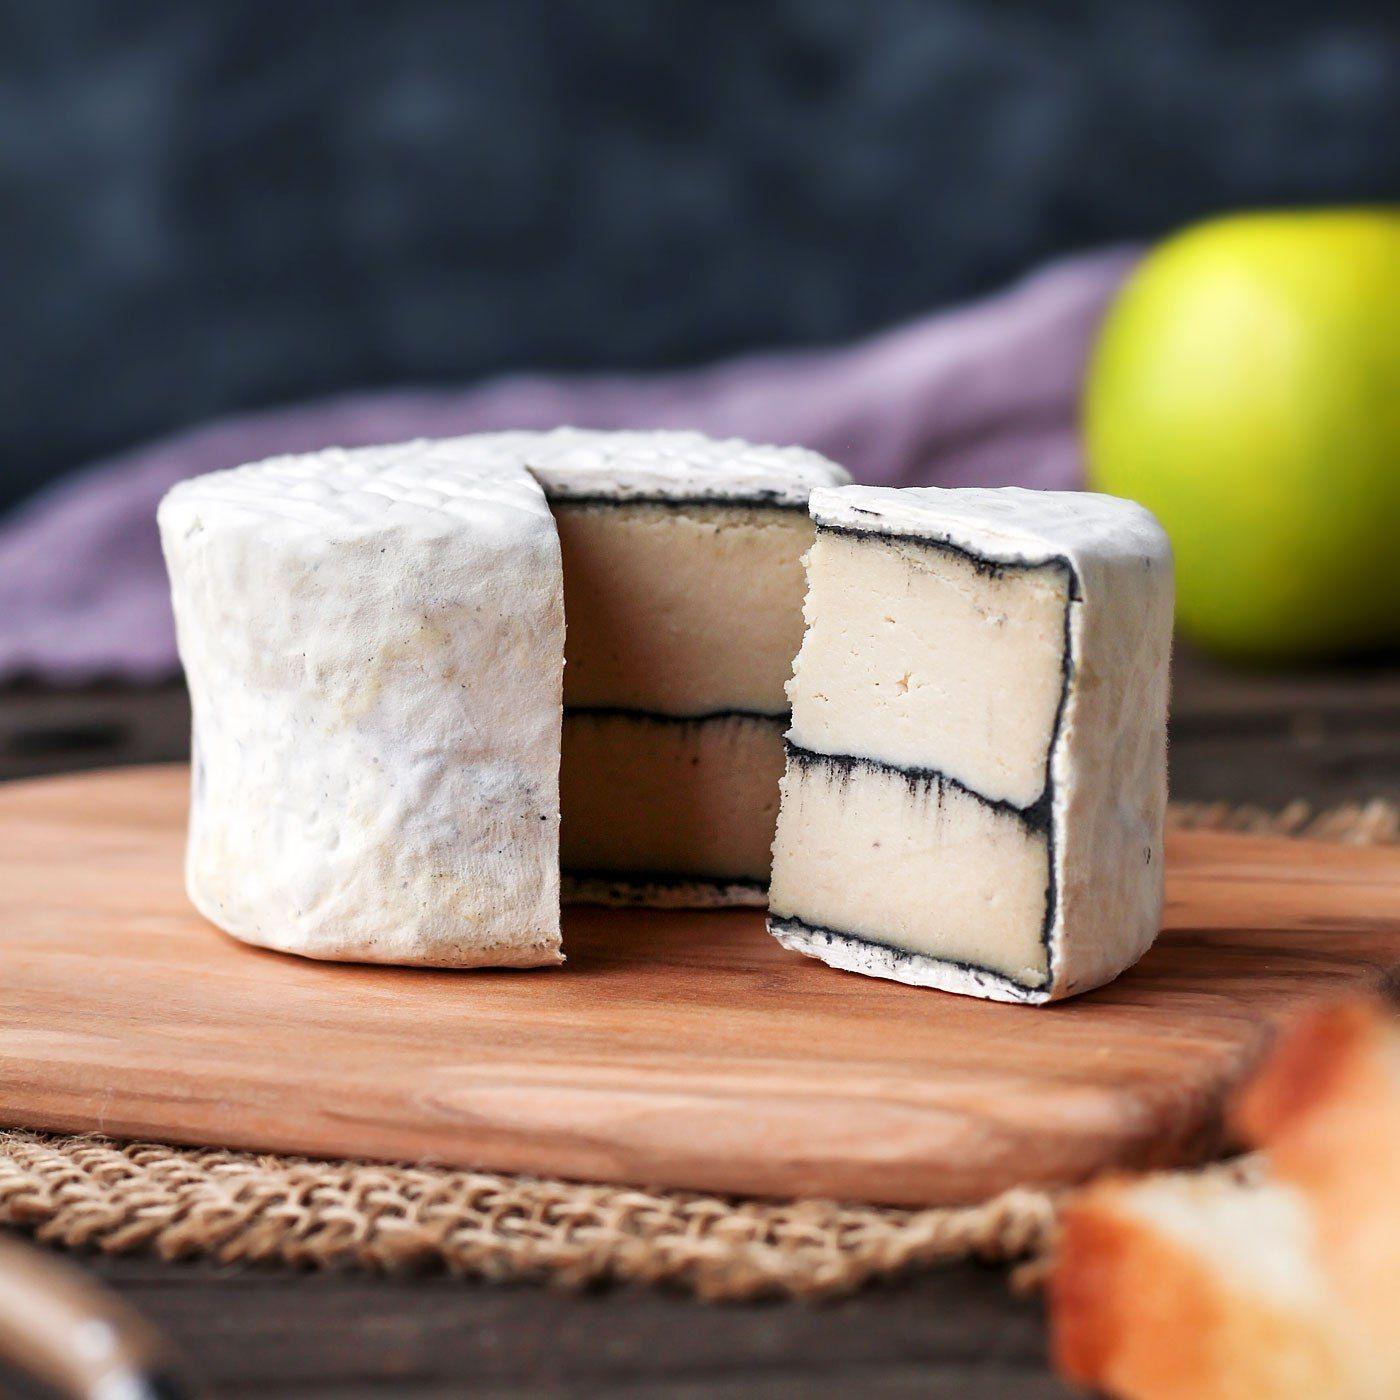 Vegan Cultured Butter Full Of Plants Recipe Vegan Cheese Recipes Vegan Cheese Milk Recipes